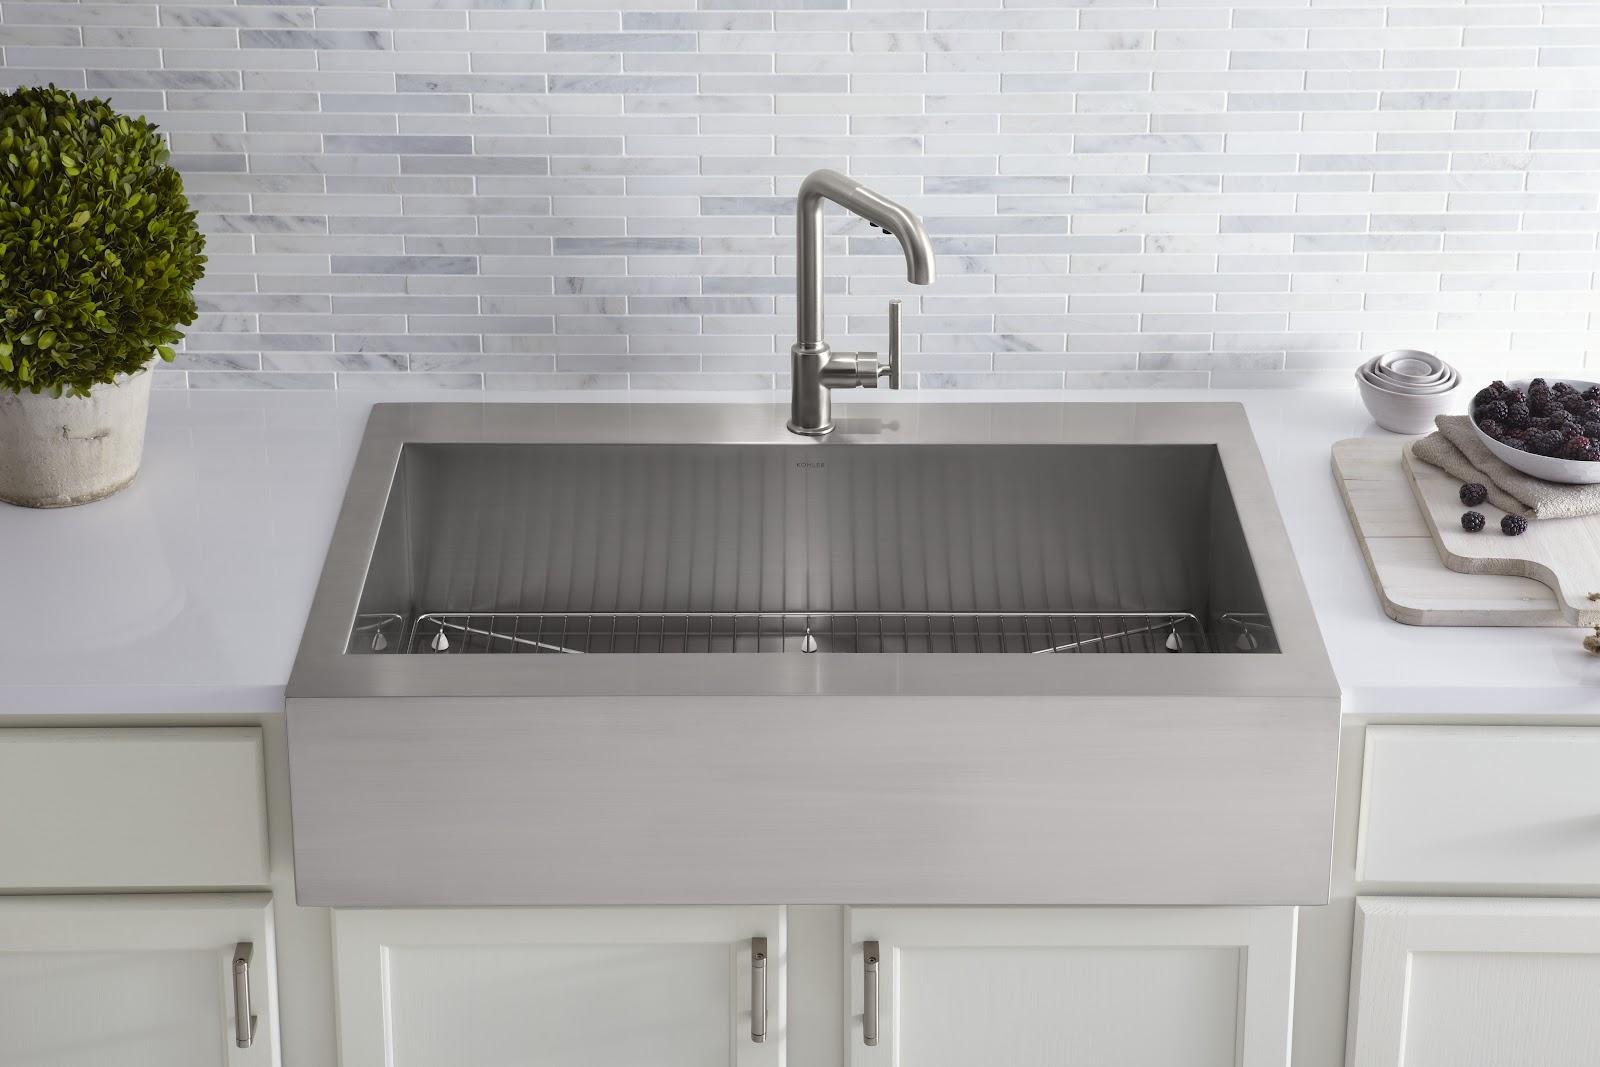 Ideas, kohler kitchen sink faucets white kohler kitchen sink faucets white kitchen convenient cleaning with stainless steel farm sink 1600 x 1067  .